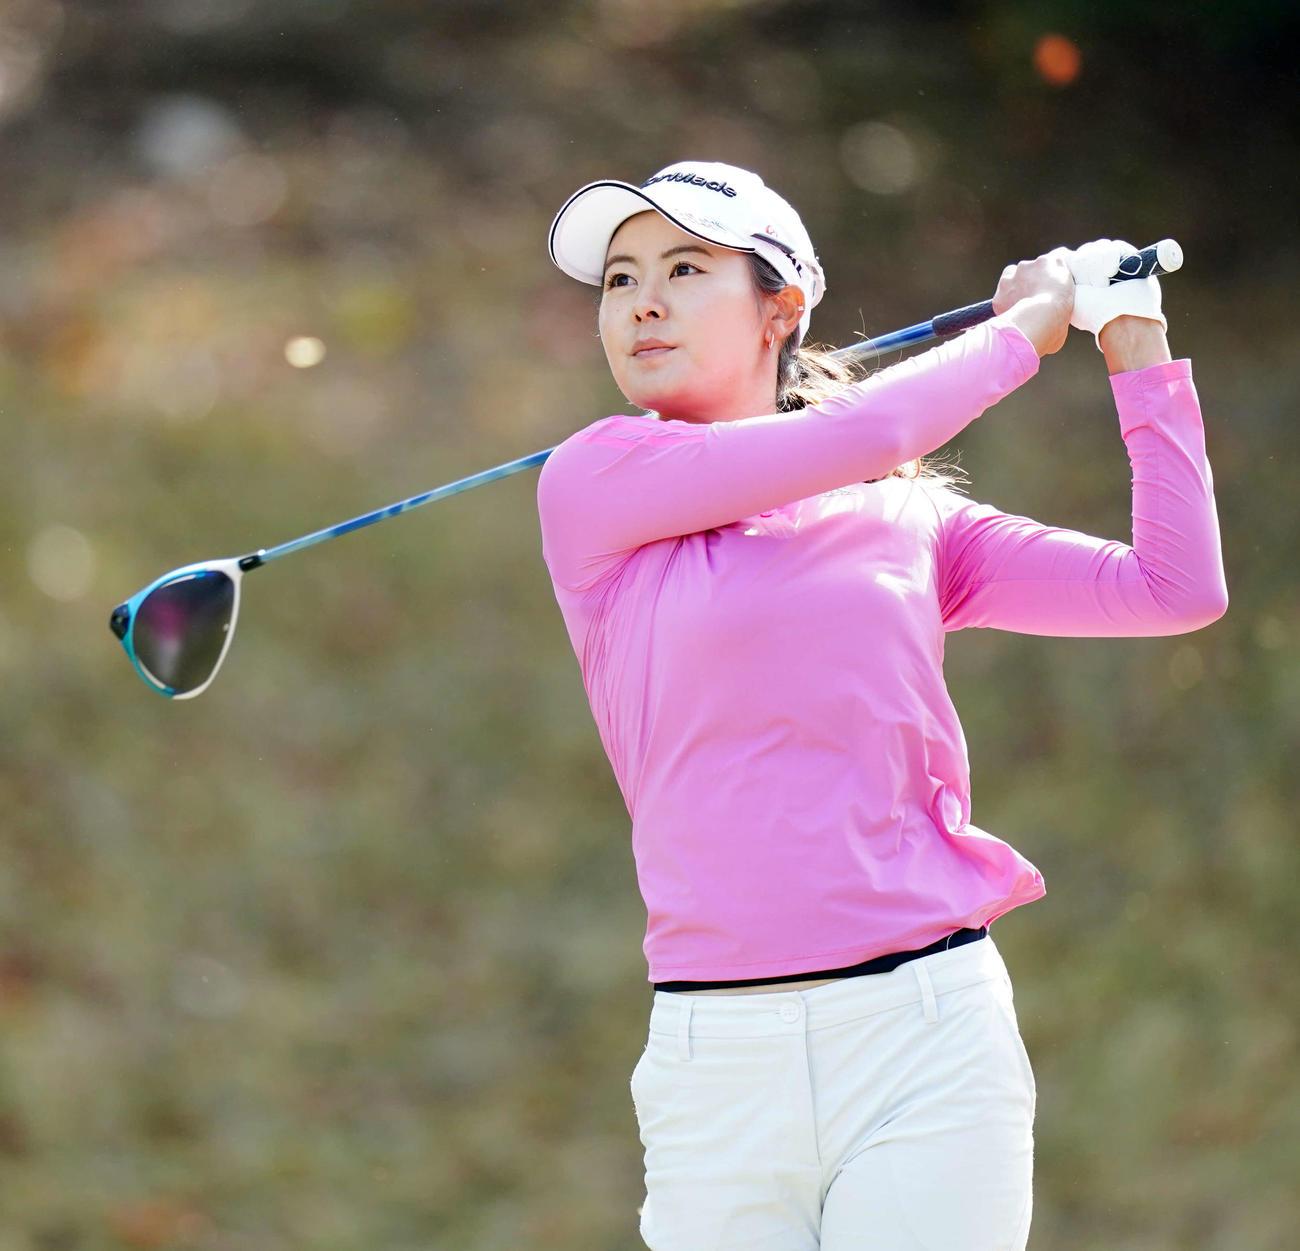 https://www.nikkansports.com/sports/golf/news/img/202104020000168-w1300_1.jpg